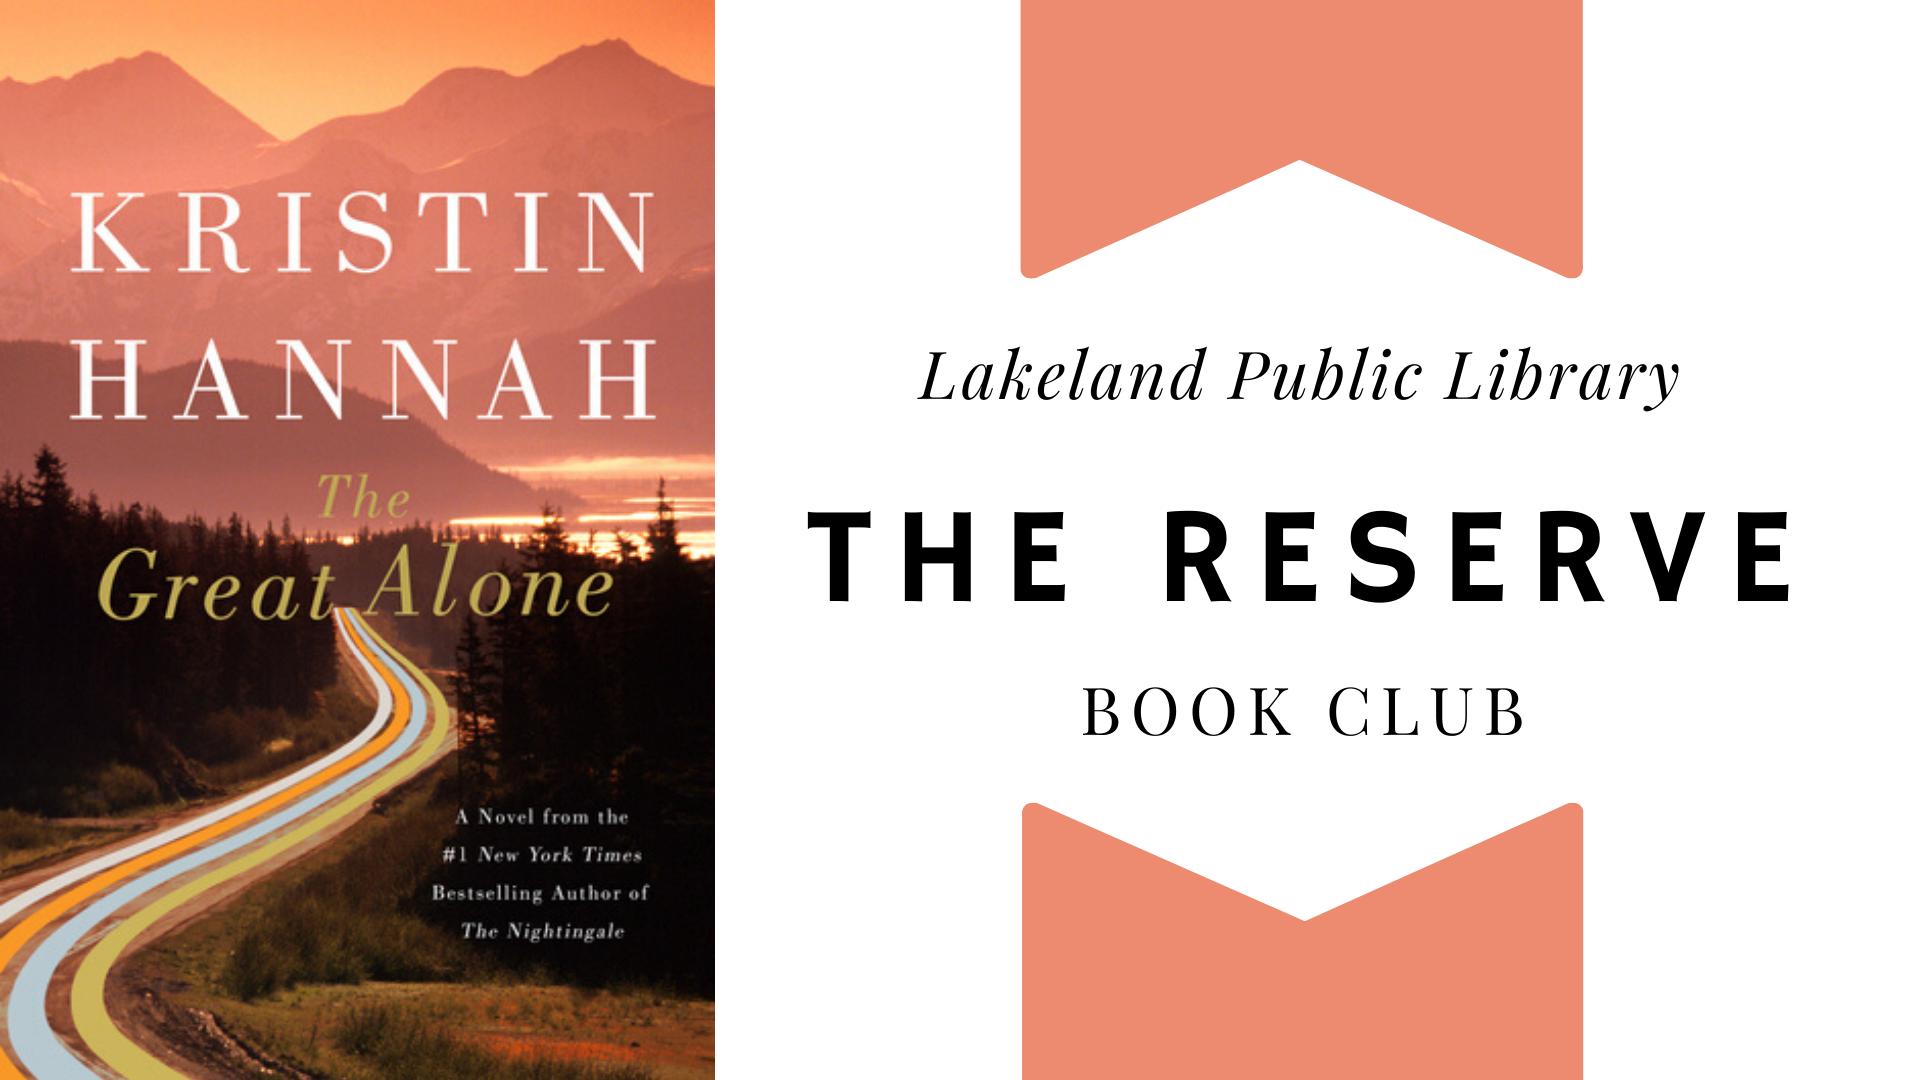 The Reserve Book Club